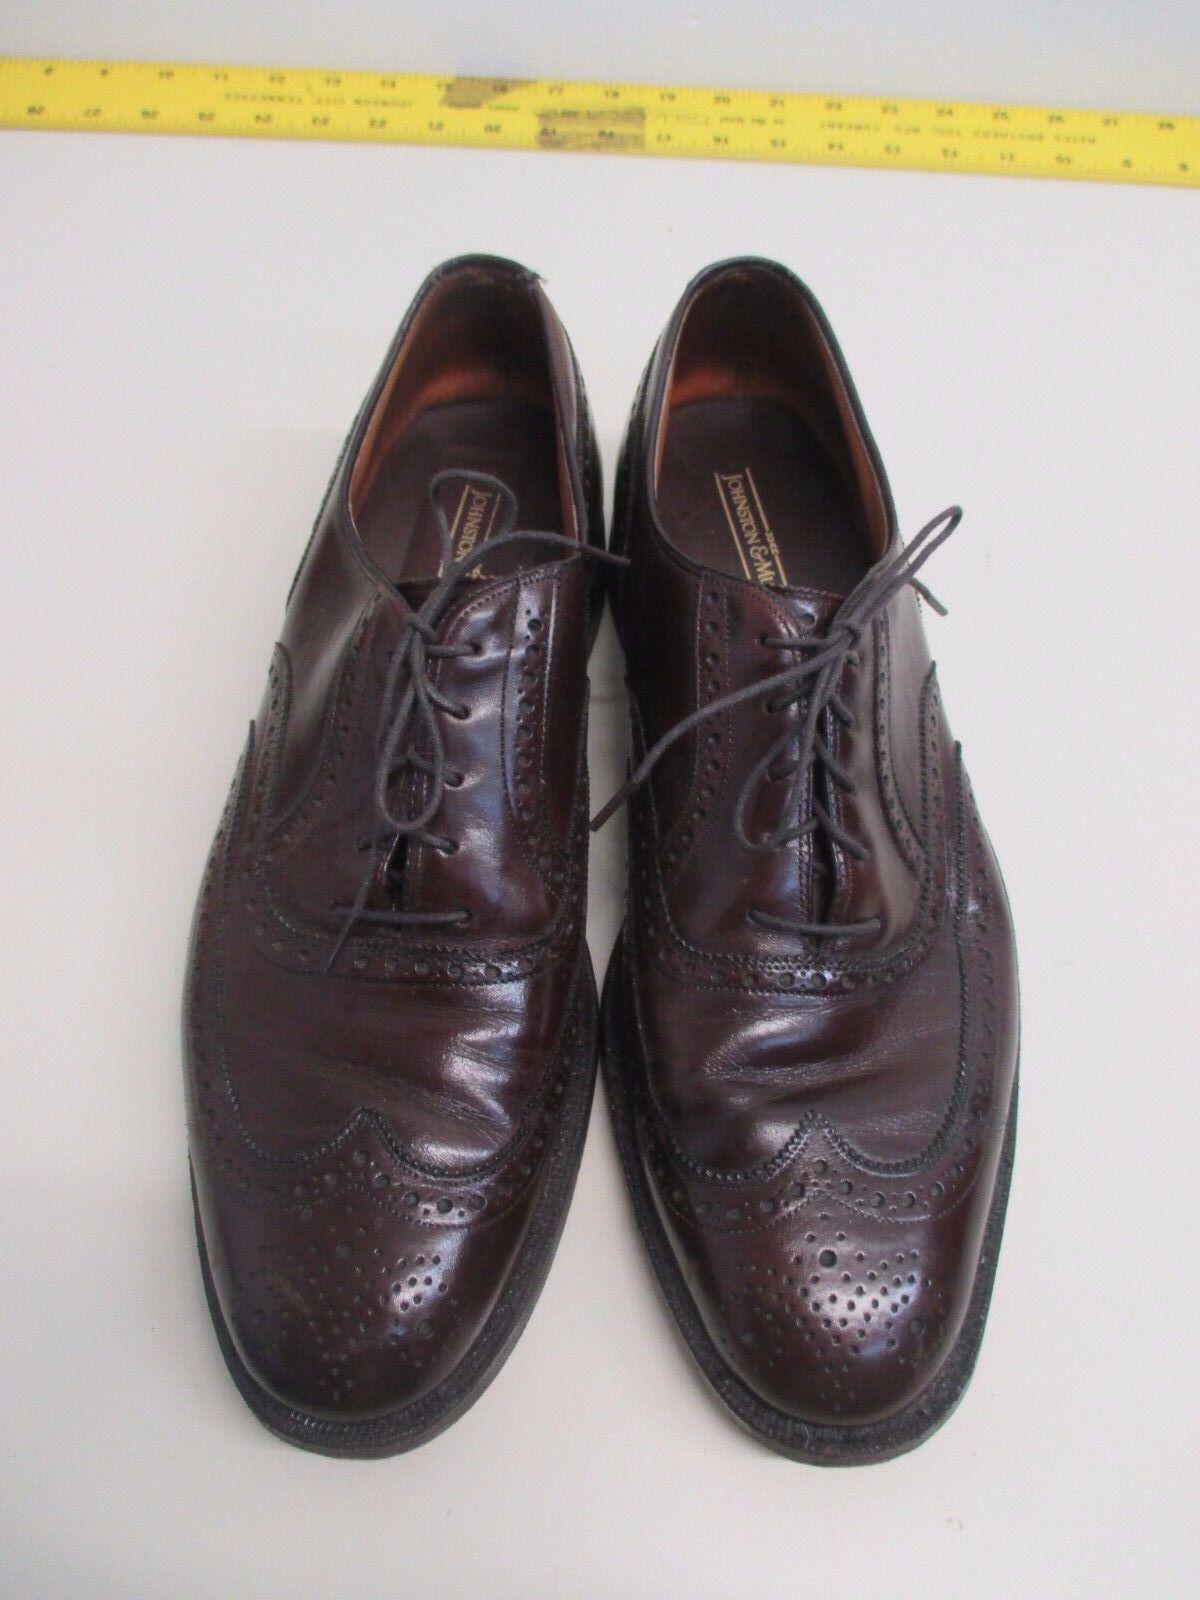 Vintage Johnston Murphy and Murphy Johnston Brown Pelle Wing Tip Oxfords size 12 C/A EUC! edcda3